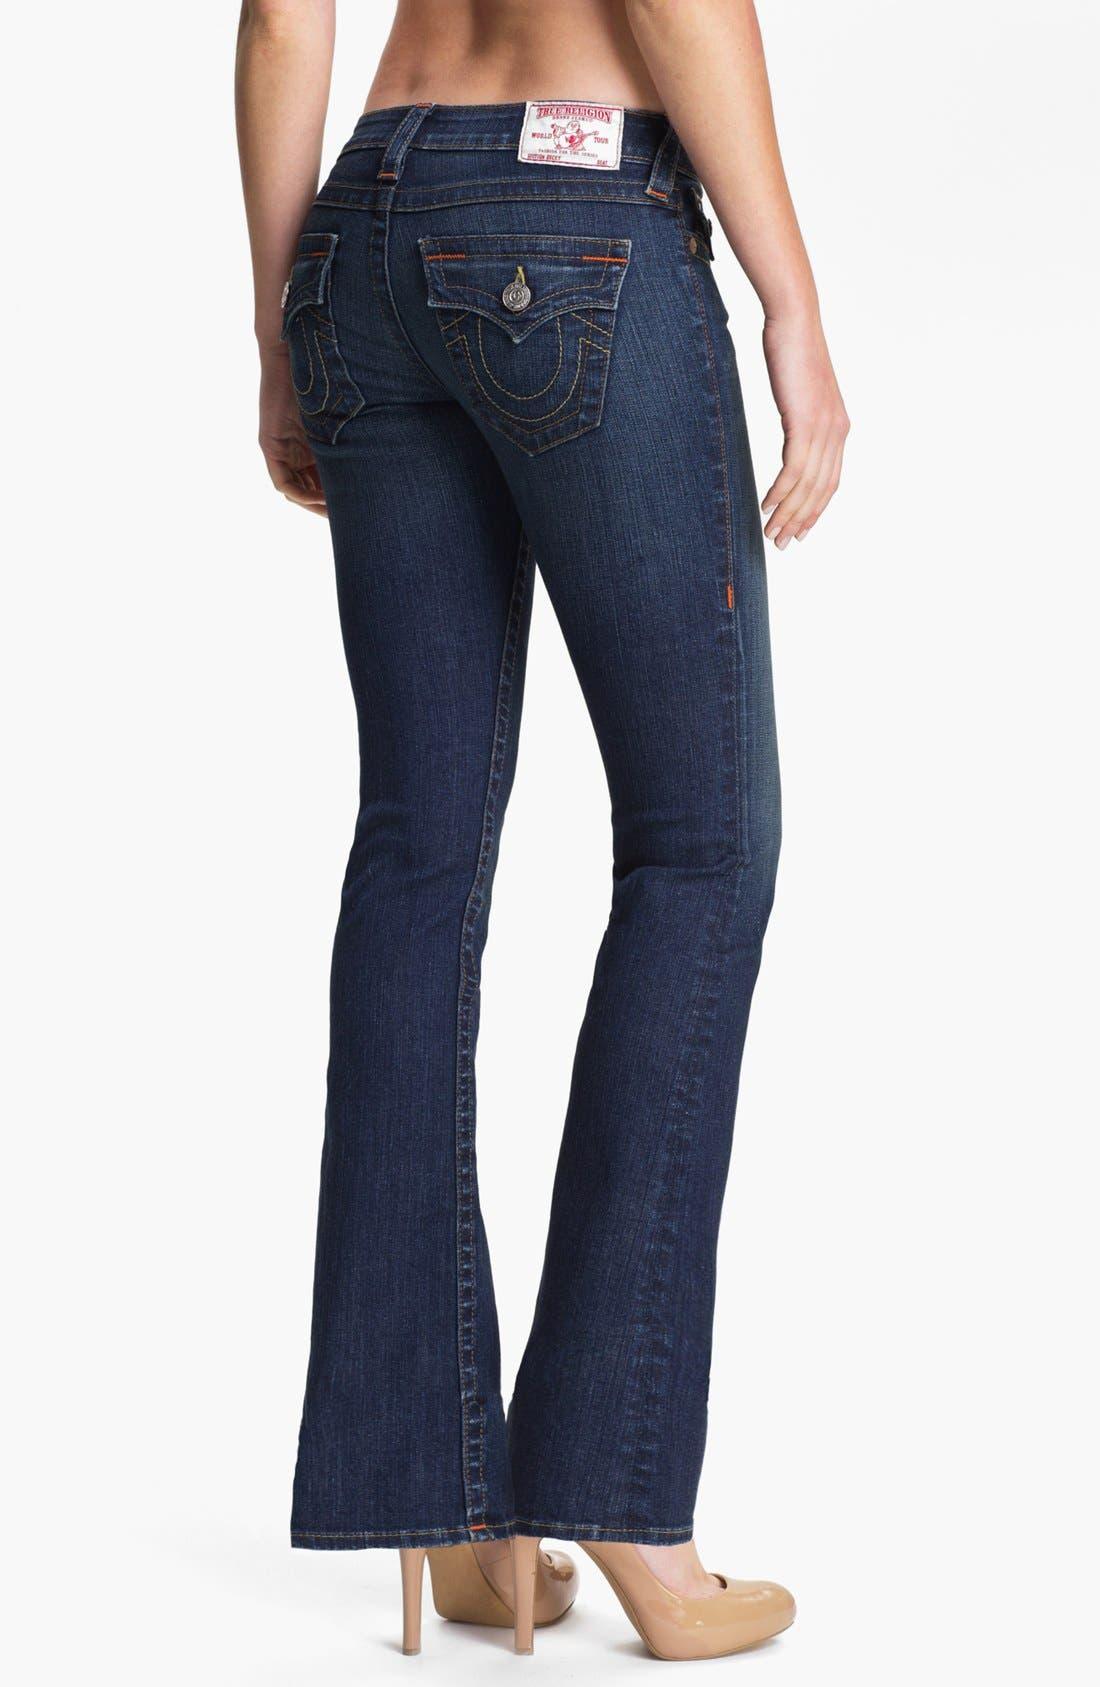 Alternate Image 2  - True Religion Brand Jeans 'Becky' Bootcut Jeans (Dusty Skies) (Petite)